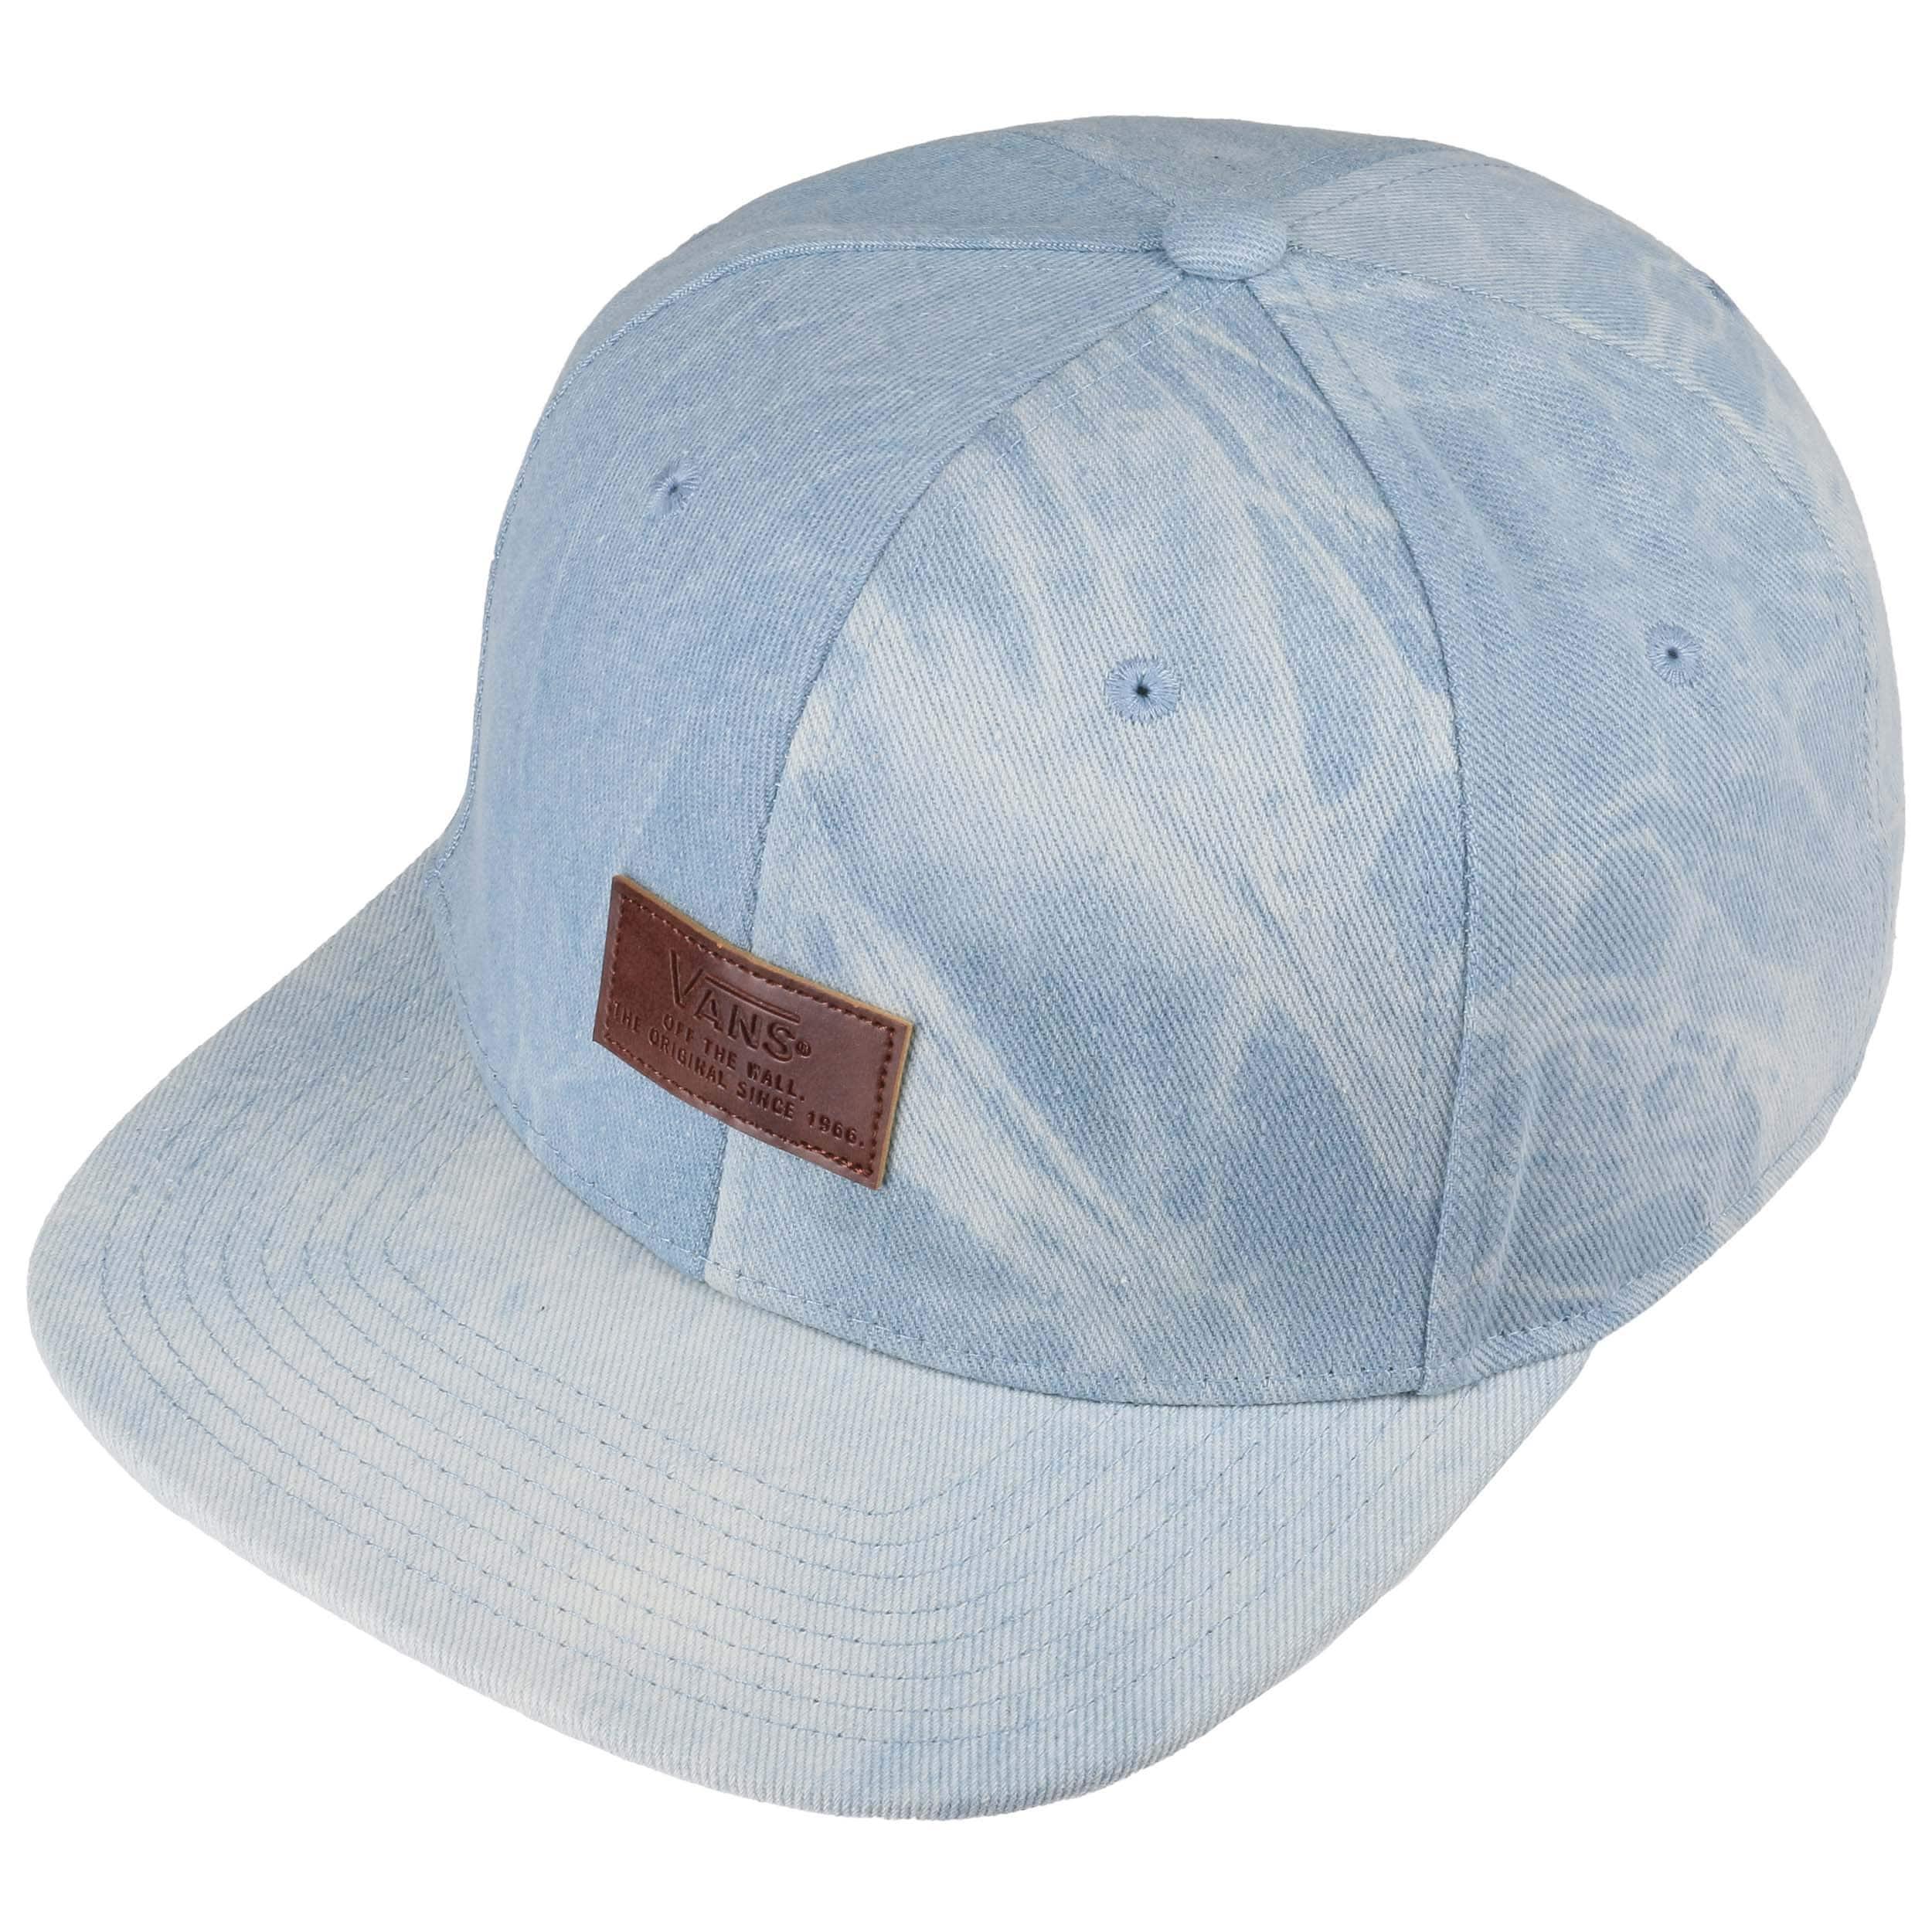 a10a9c9a939da Gorra Allover Acid Snapback by Vans - Gorras - sombreroshop.es